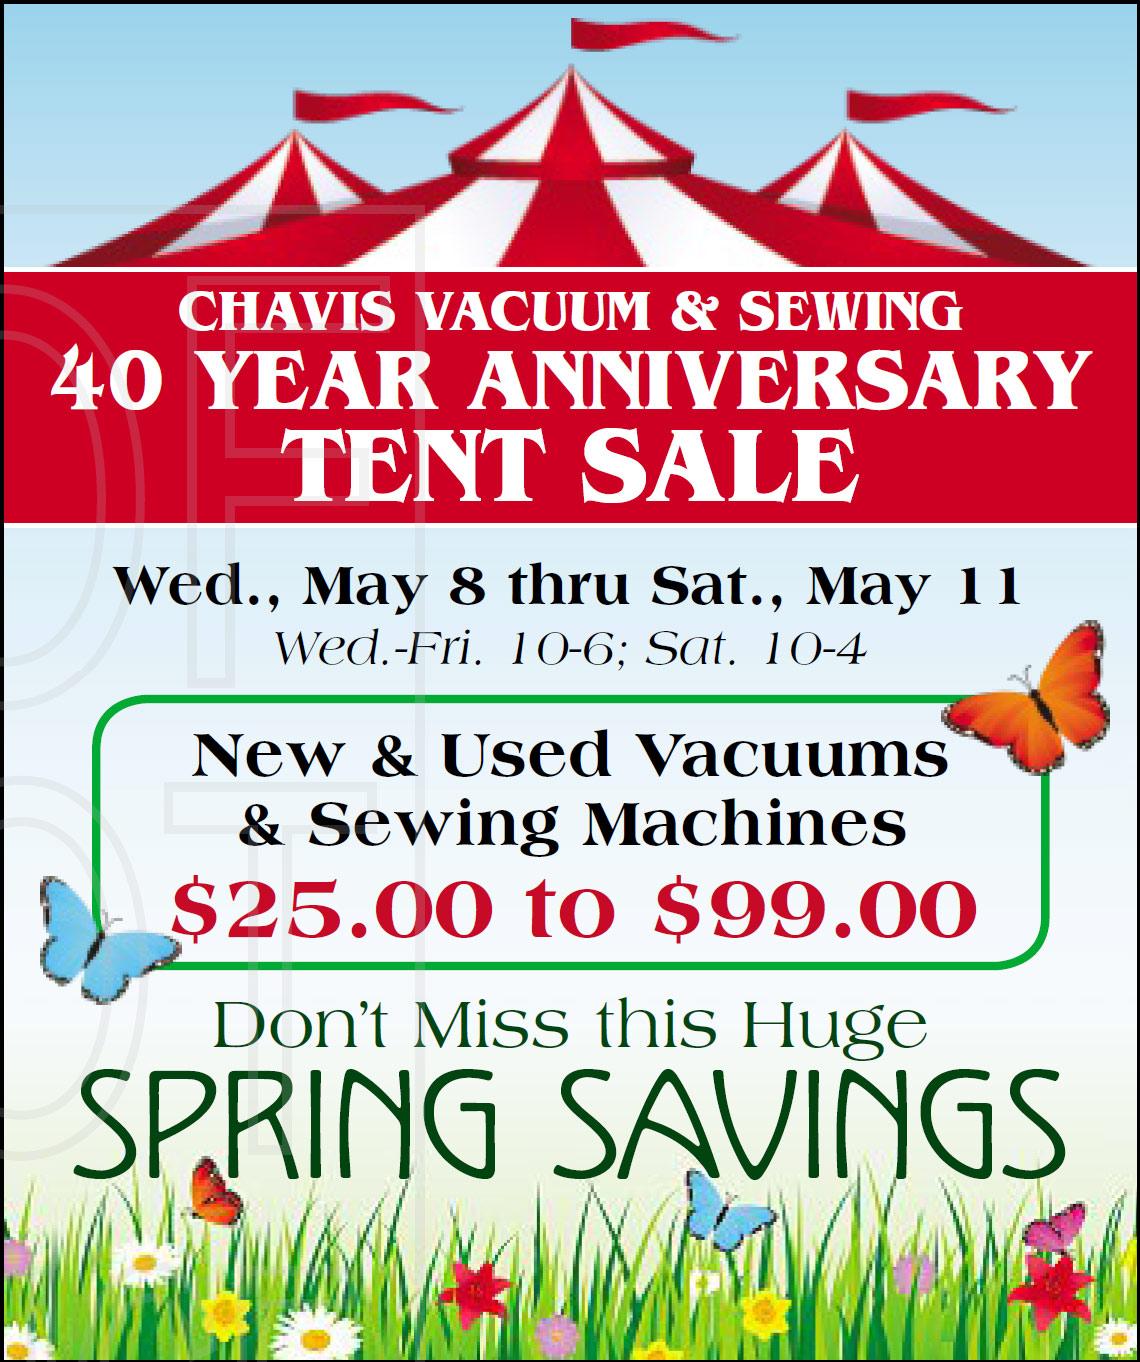 Tent Sale, Chavis Vacuum & Sewing, Burnsville, MN